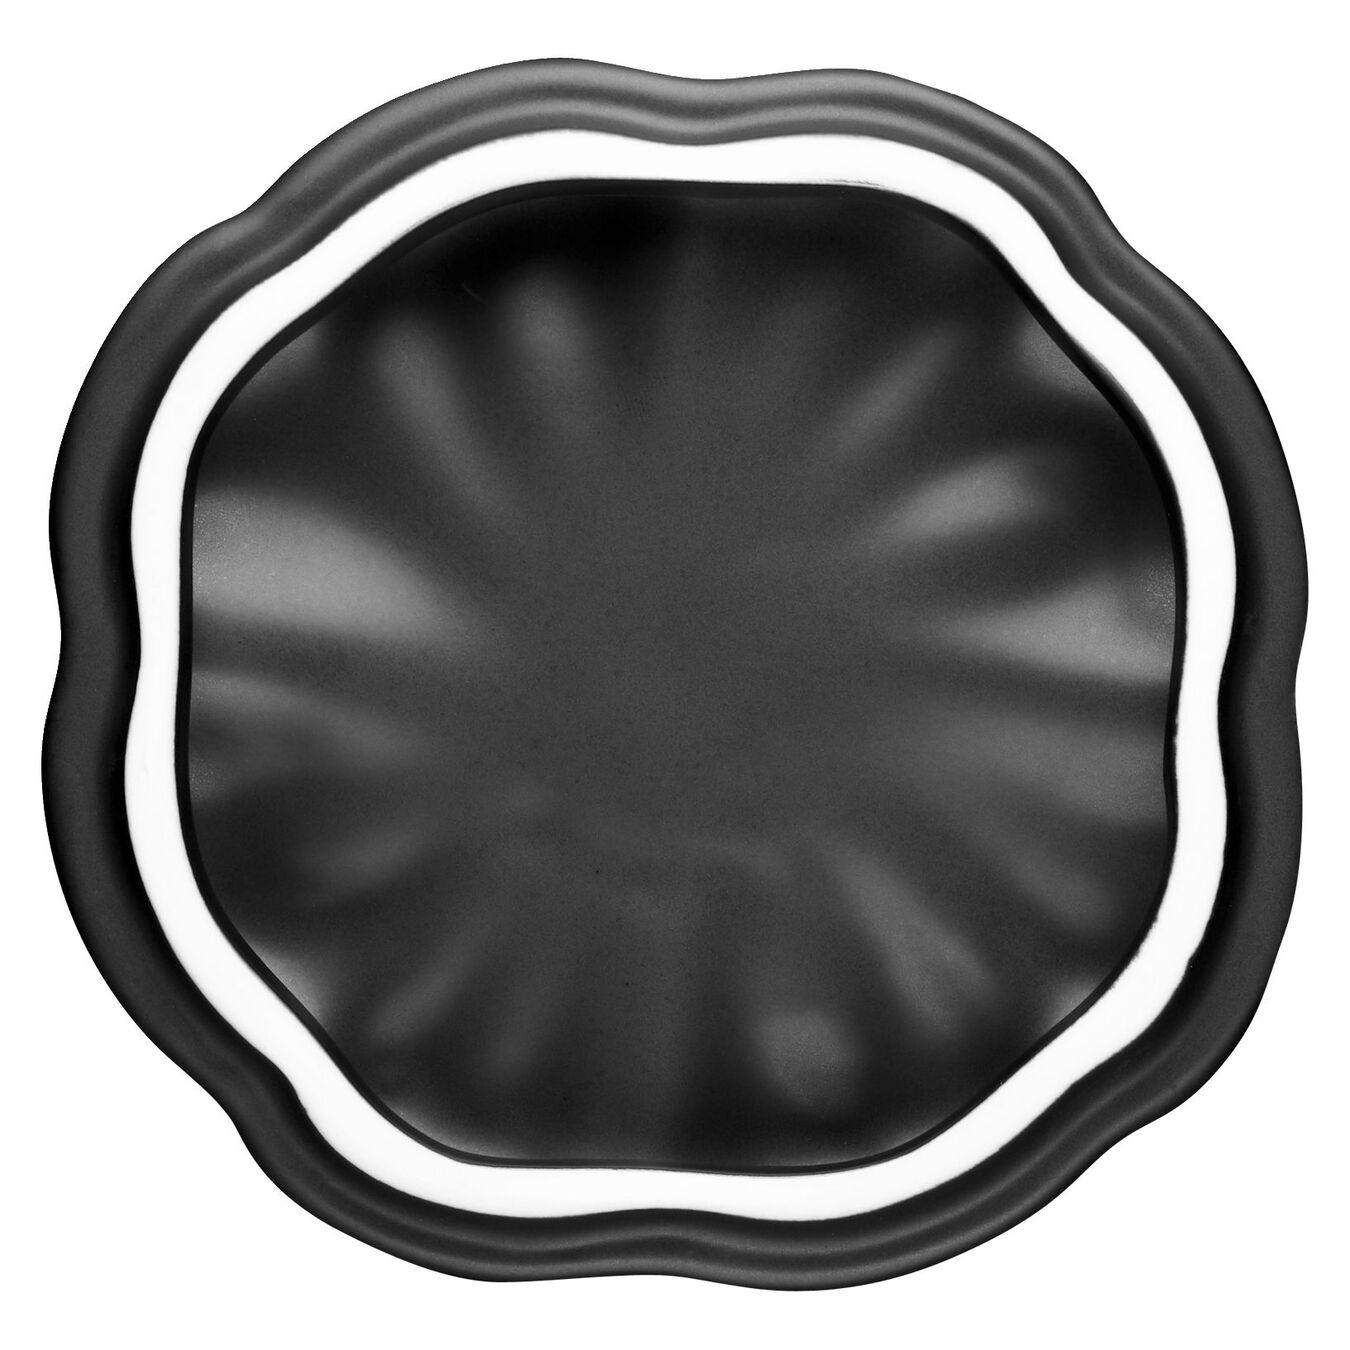 Keramik-Kürbis 0.75qt / 0.7 l - Black Matte 15 cm, Kürbis, Schwarz, Keramik,,large 5